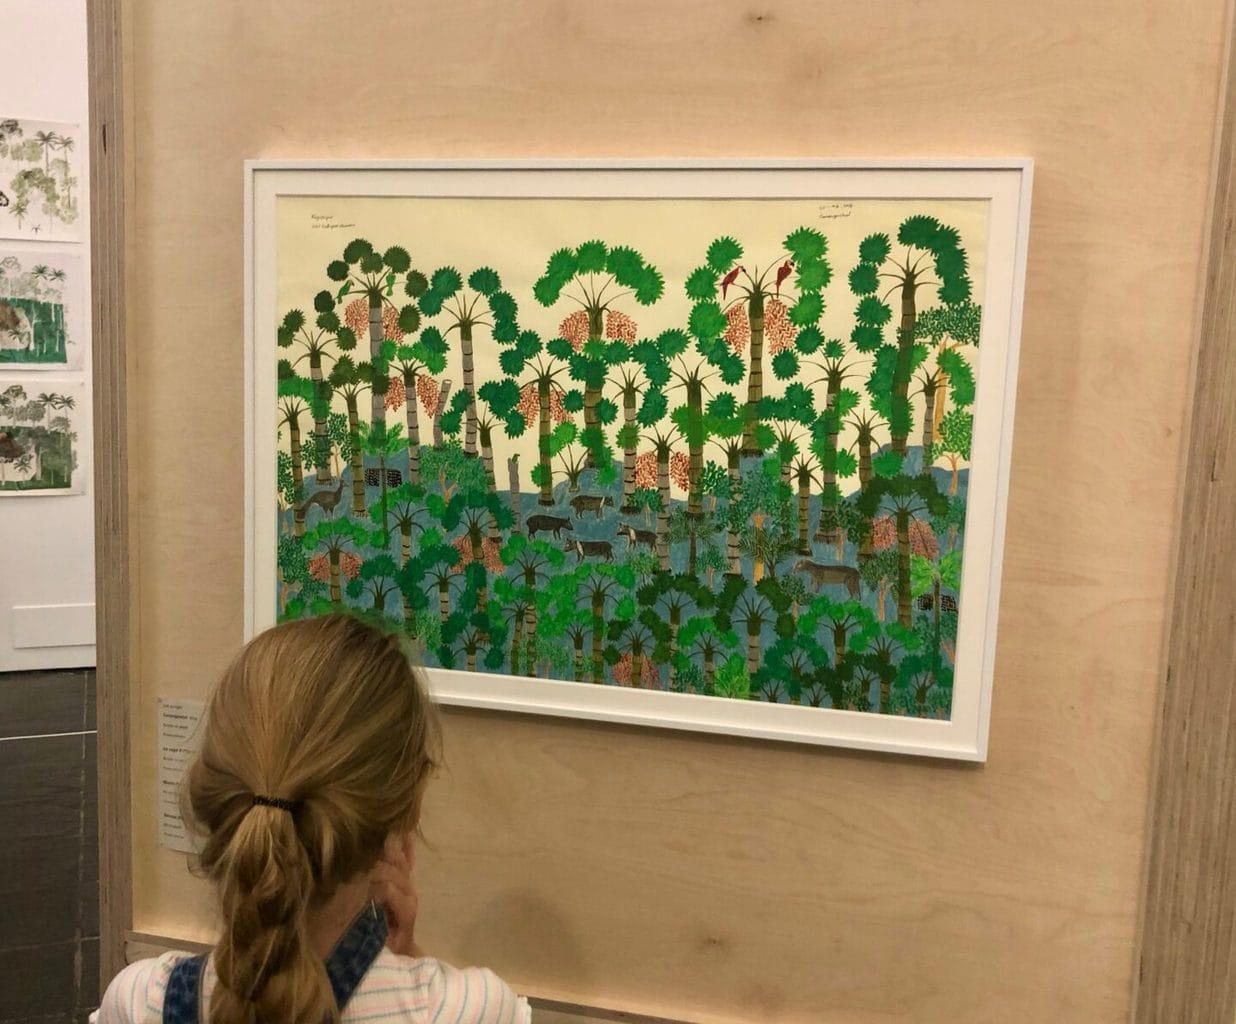 Little Miss enjoying the Abel Rodriguez exhibition